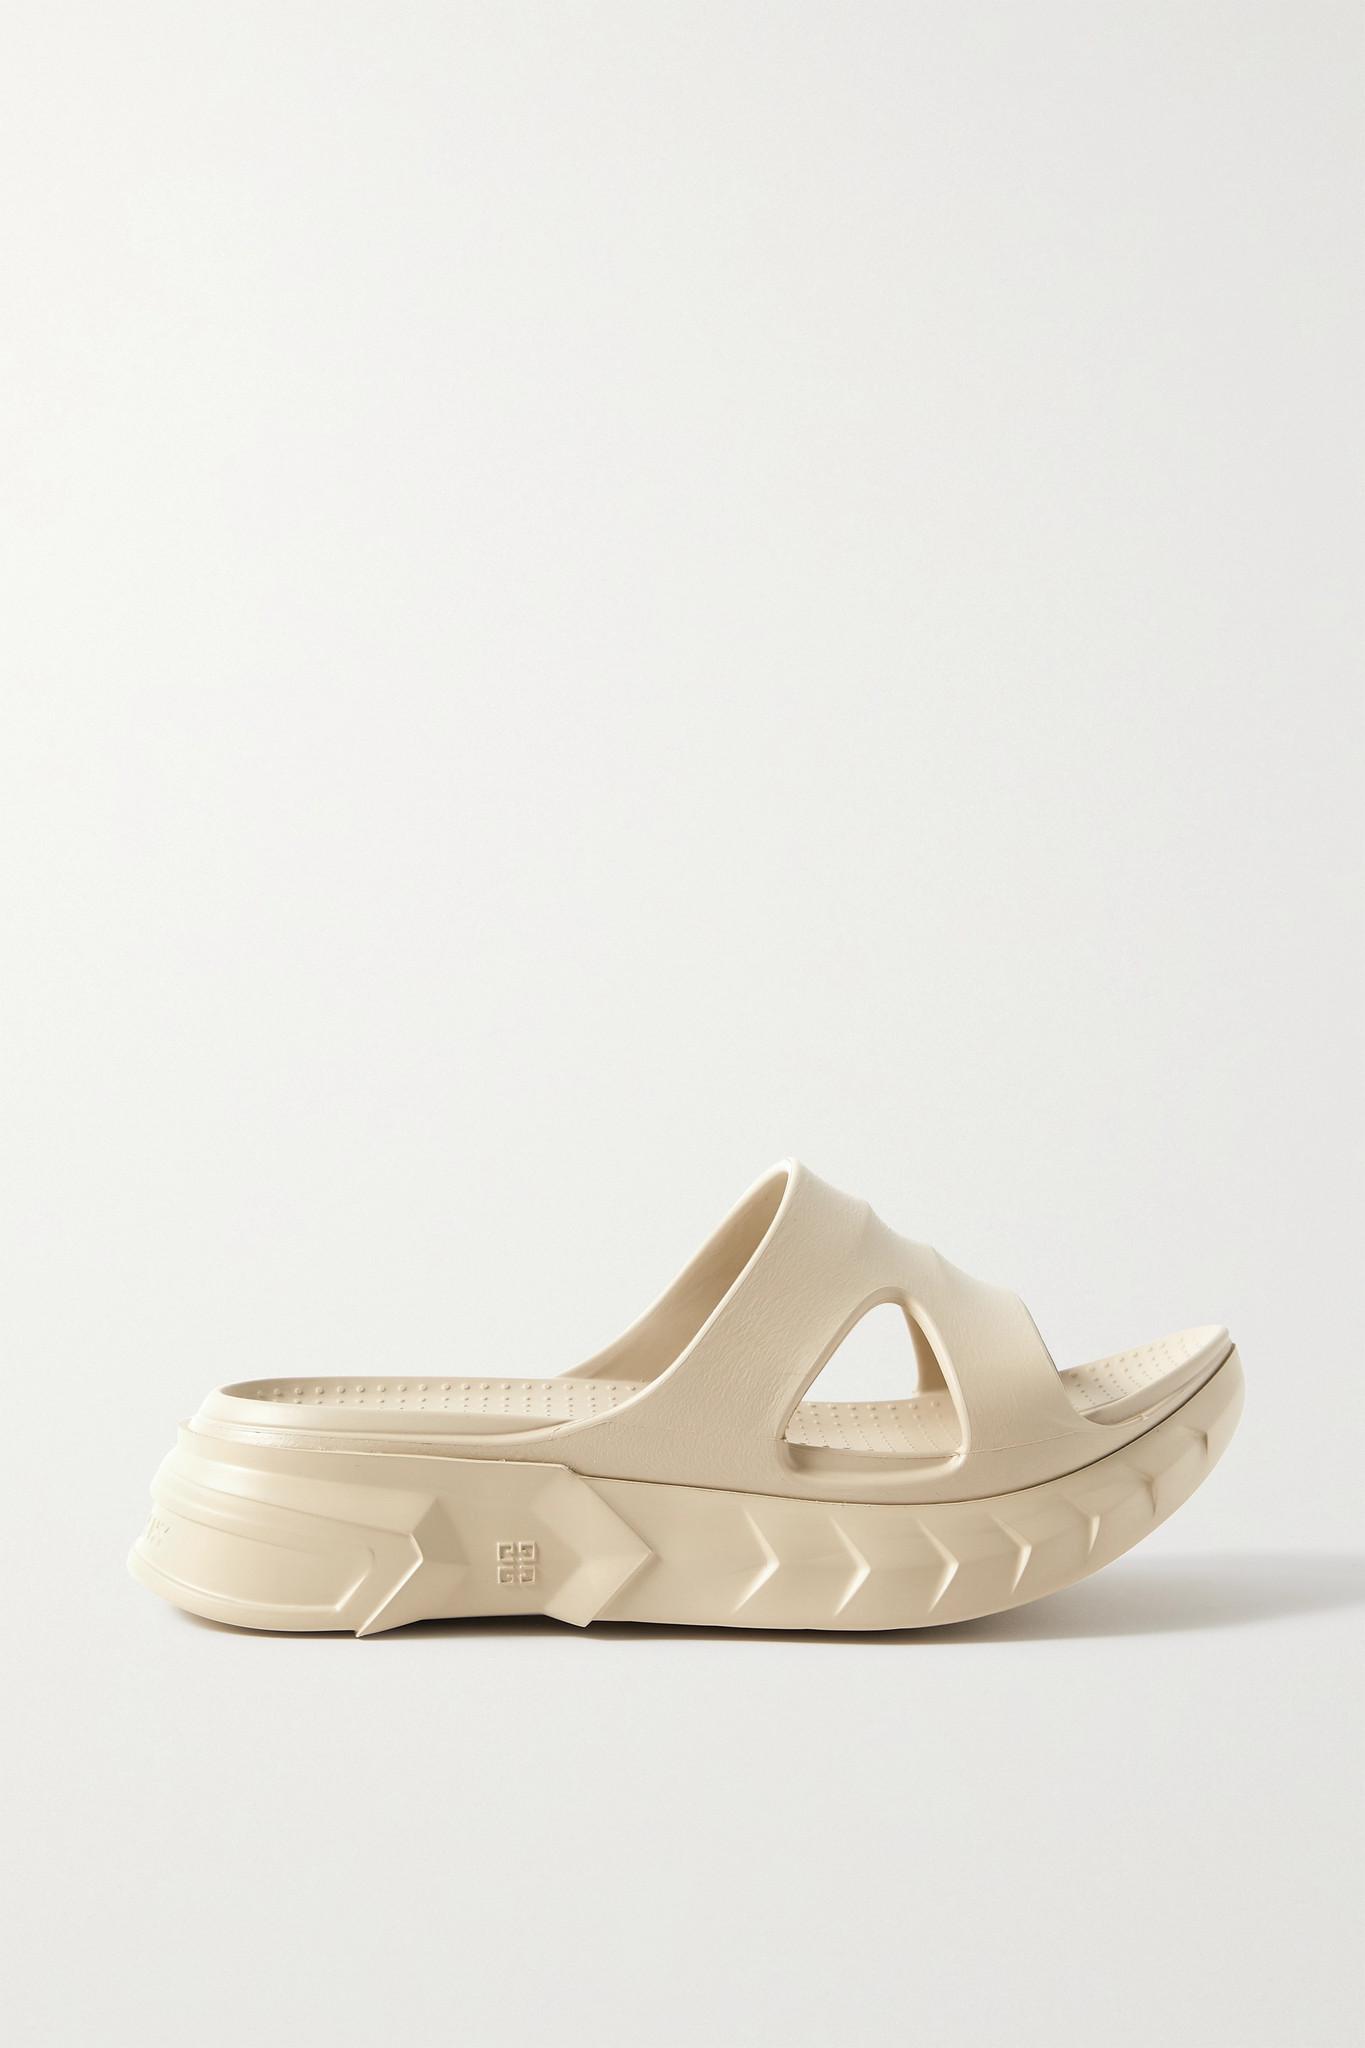 GIVENCHY - Marshmallow 橡胶拖鞋 - 中性色 - IT39